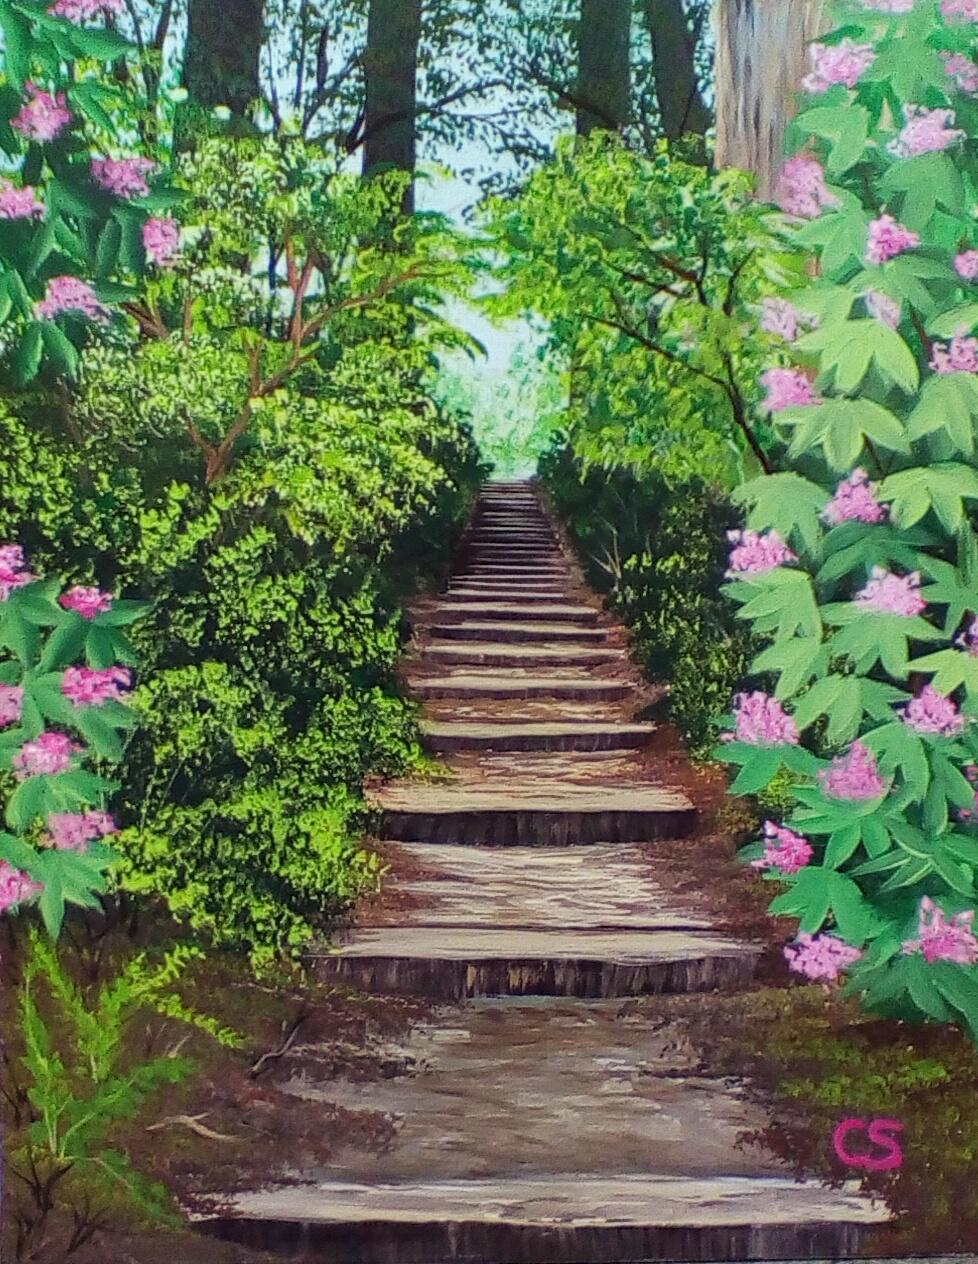 Stairway to Glendalough